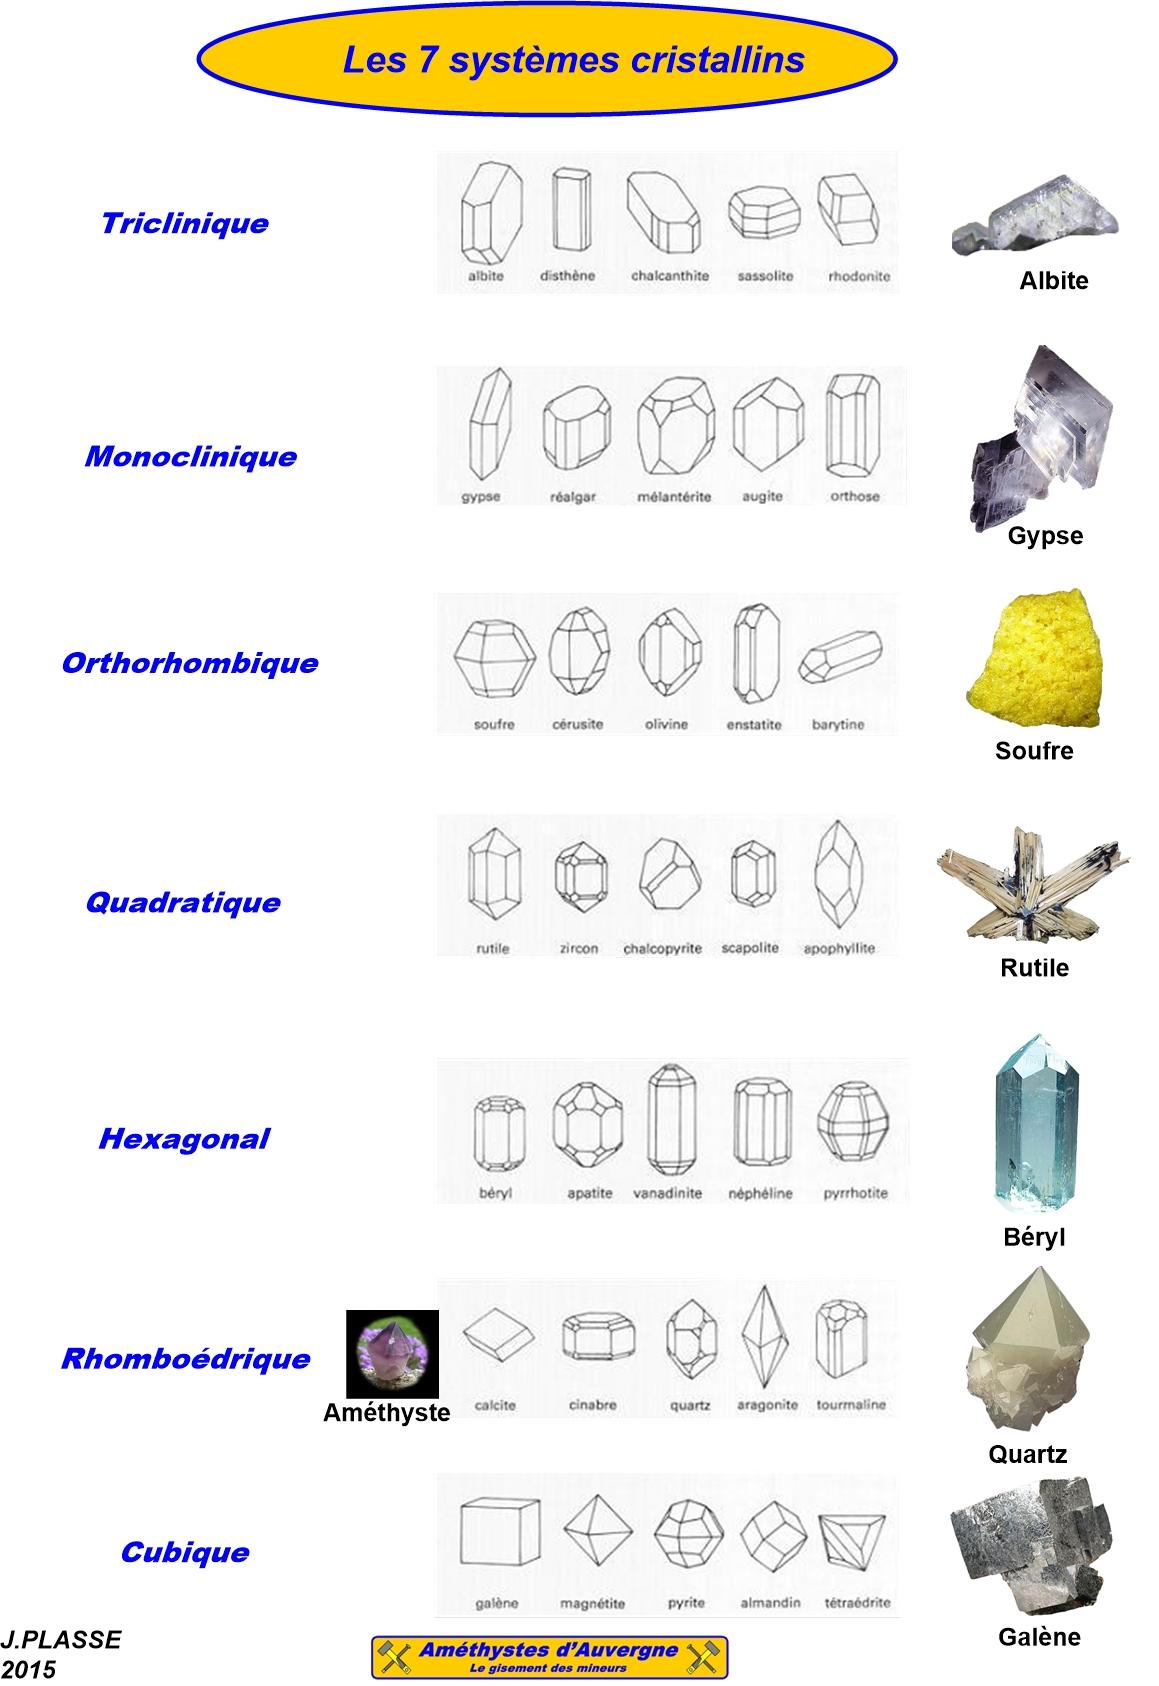 Systeme cristallin jpeg